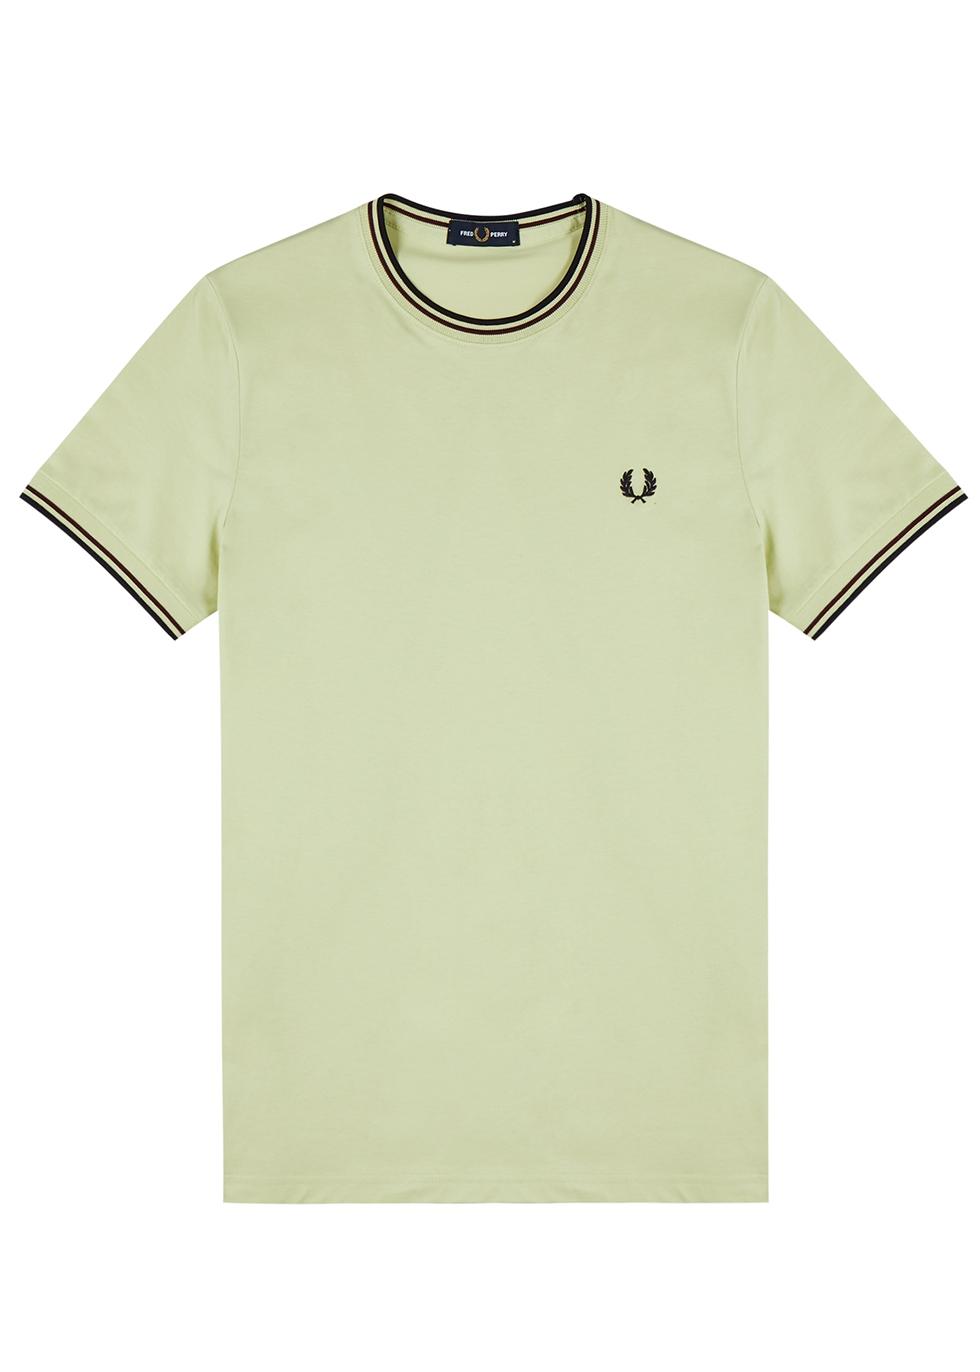 M1588 lime cotton T-shirt